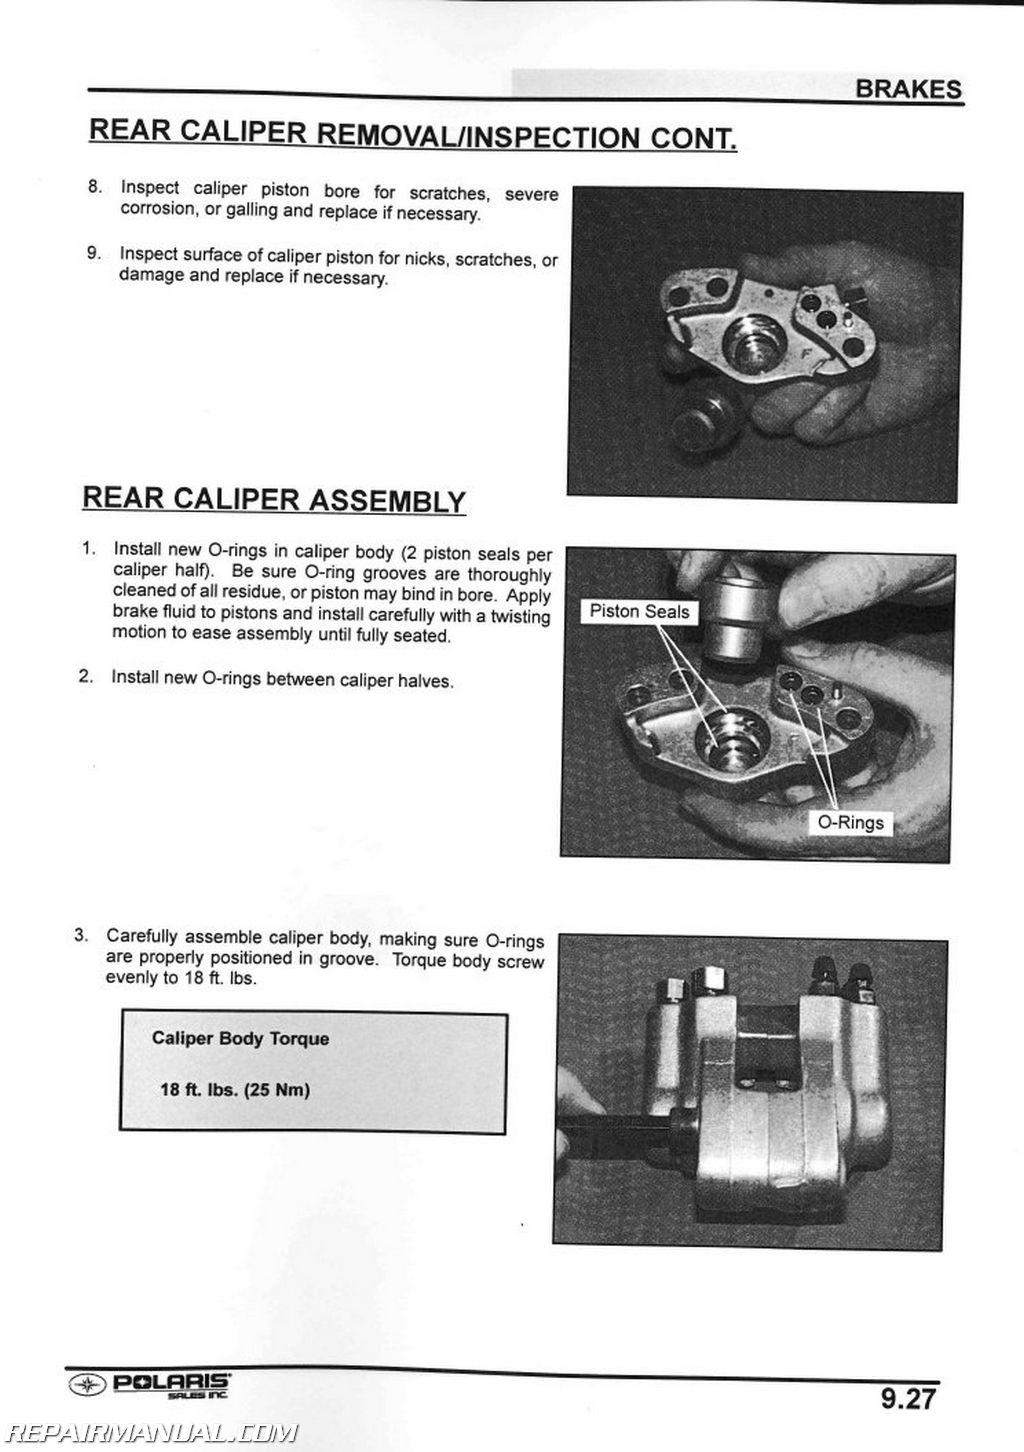 2000 polaris xplorer 250 400 atv service manual rh repairmanual com owners manual 2000 polaris pro virage tx 1200 owners manual 2000 polaris pro virage tx 1200